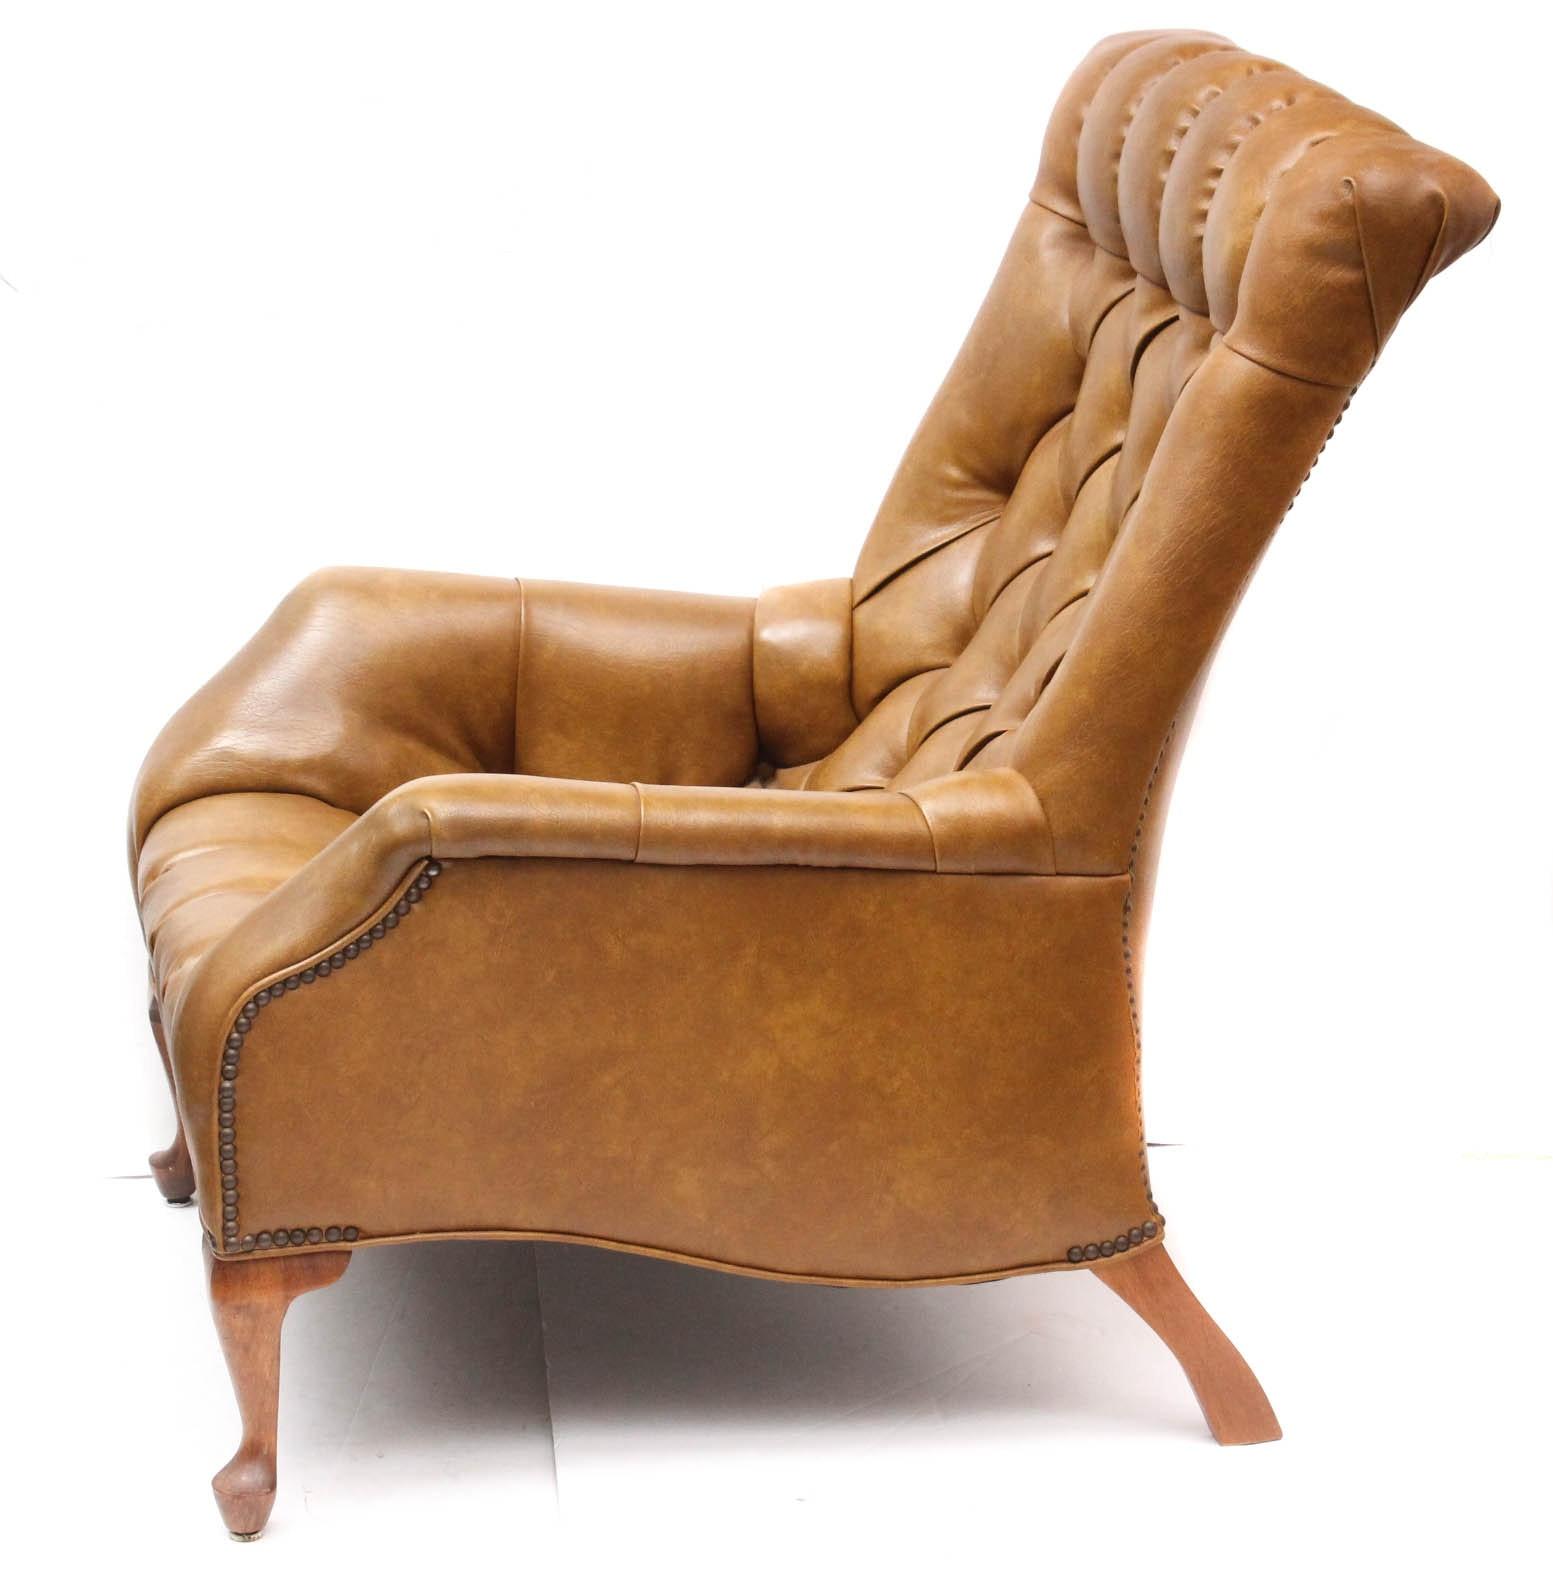 Sleepy Hollow Auto >> Vintage Sleepy Hollow Chair with Ottoman by Mall City Furniture : EBTH